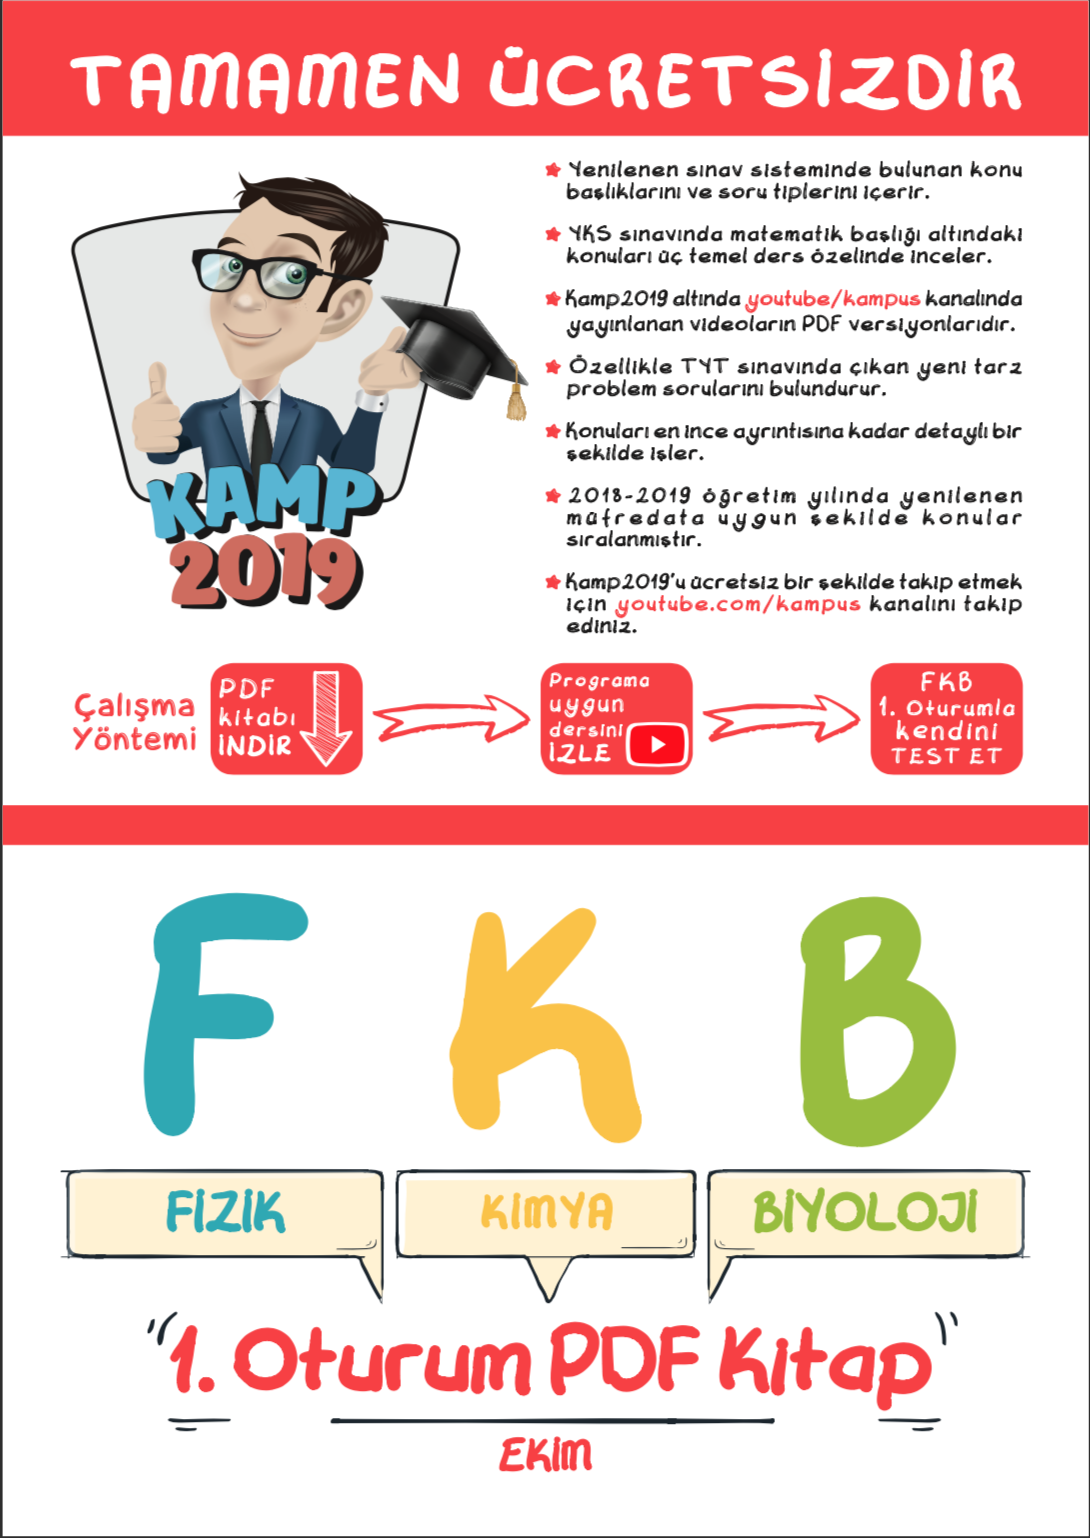 Kamp 2019 - EKİM - FKB